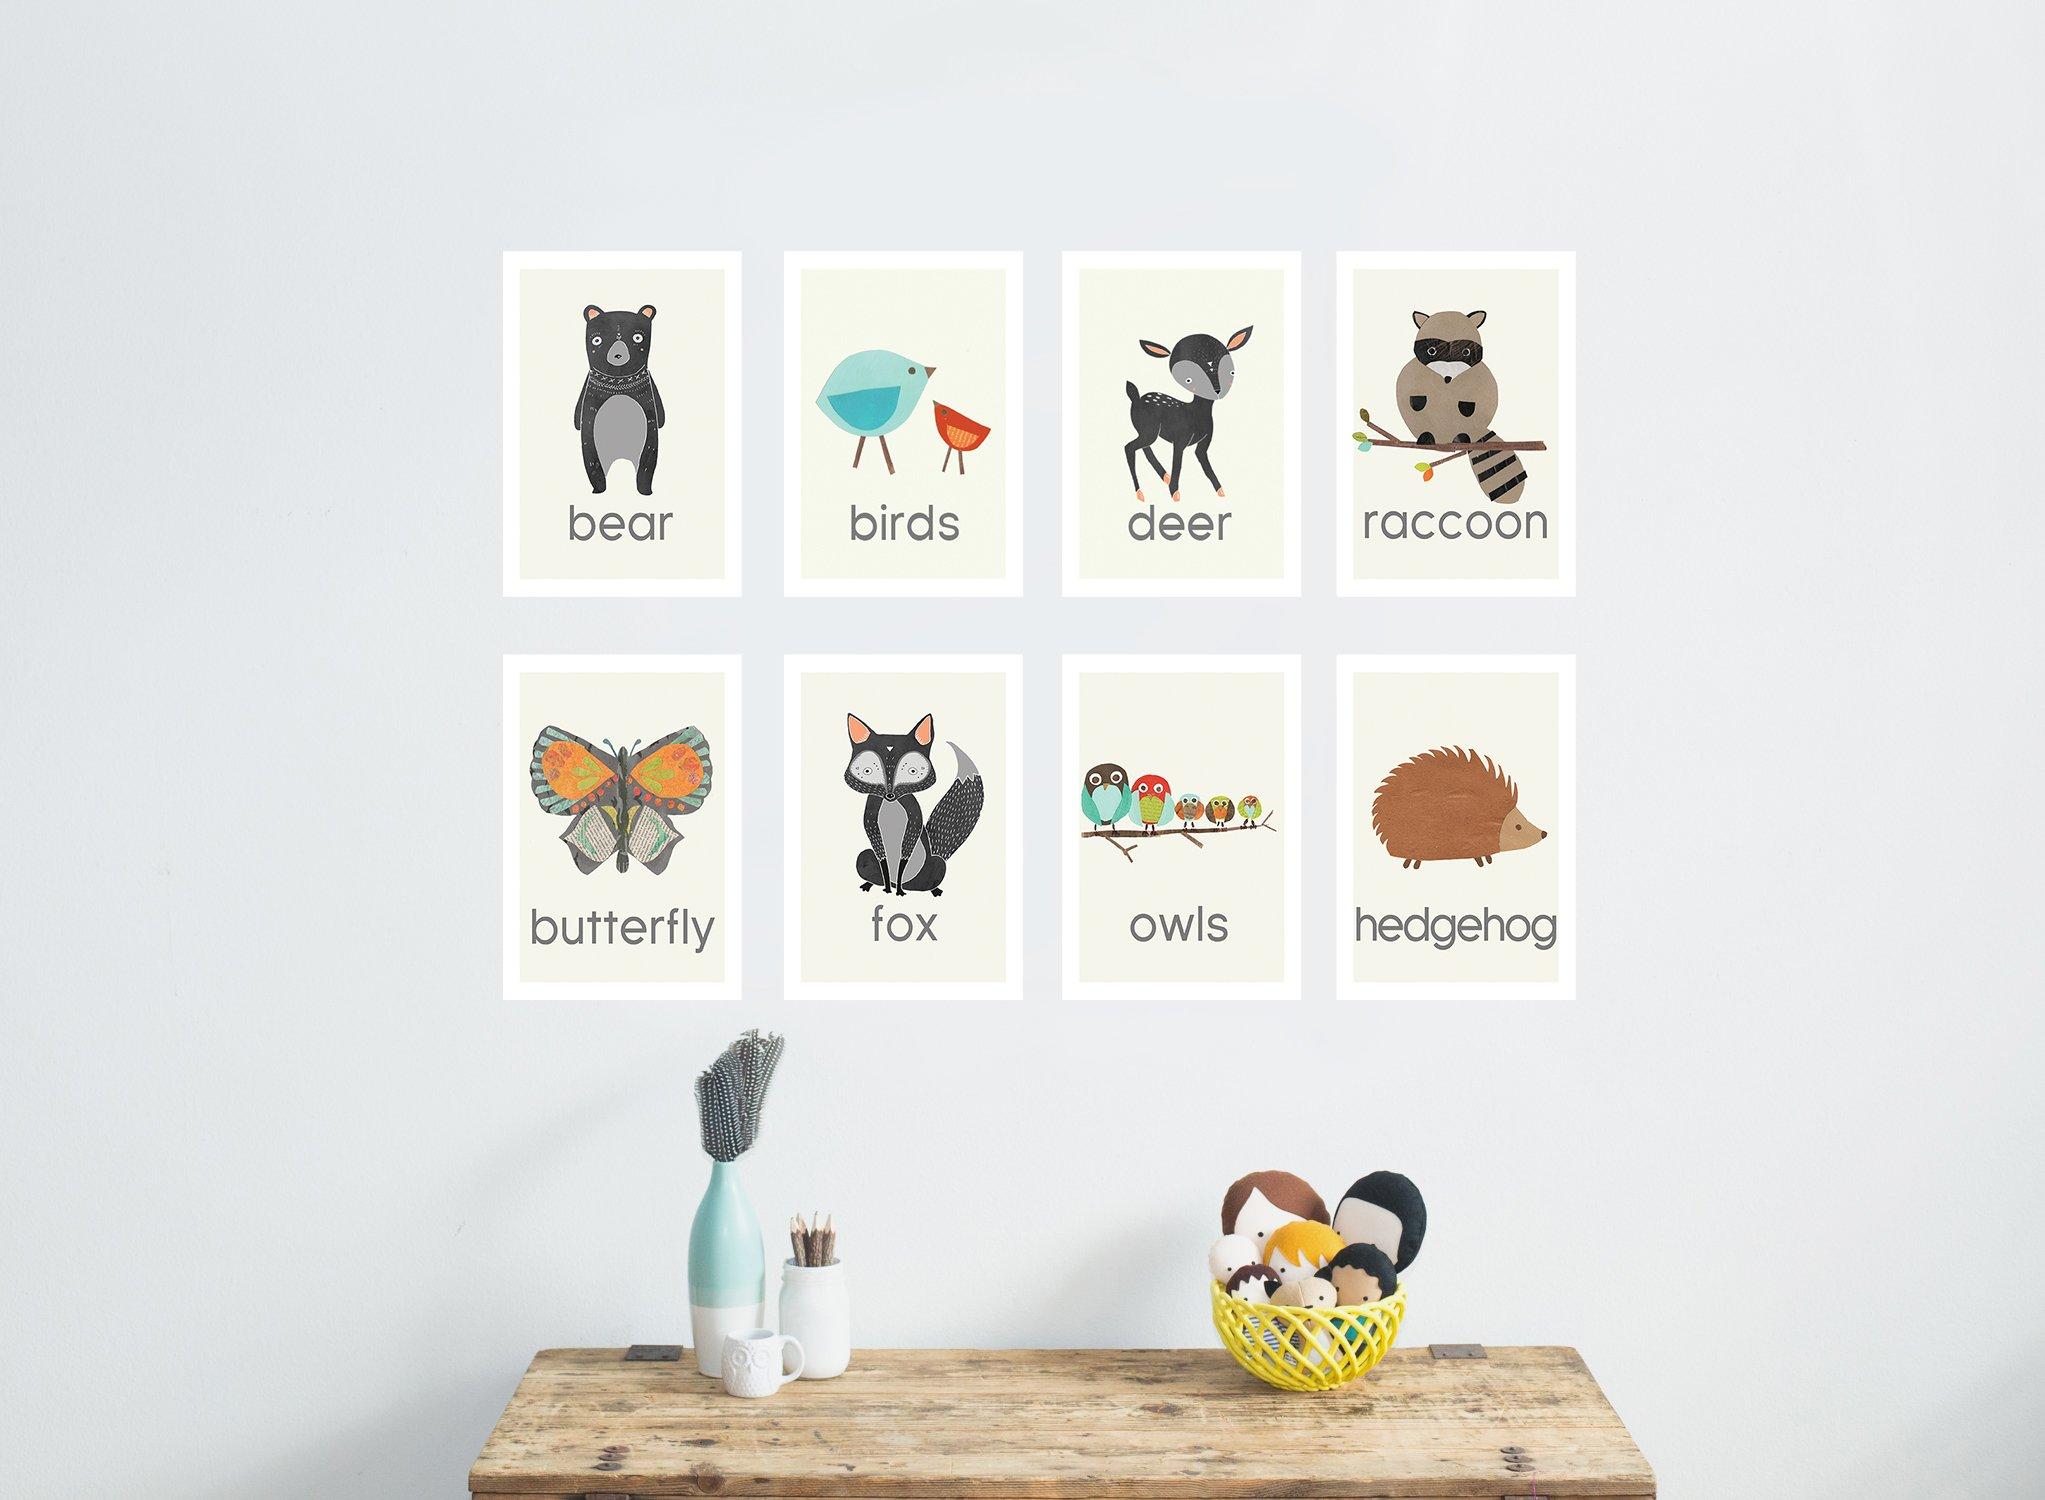 Nature Animal Mini Print Collection, 5x7 Wall Cards, Nursery Wall Art Decor, Kid's Art Decor, Gender Neutral Nursery, Forest Animals, Woodland Nursery, Nature Themed Wall Art, Preschool Decor